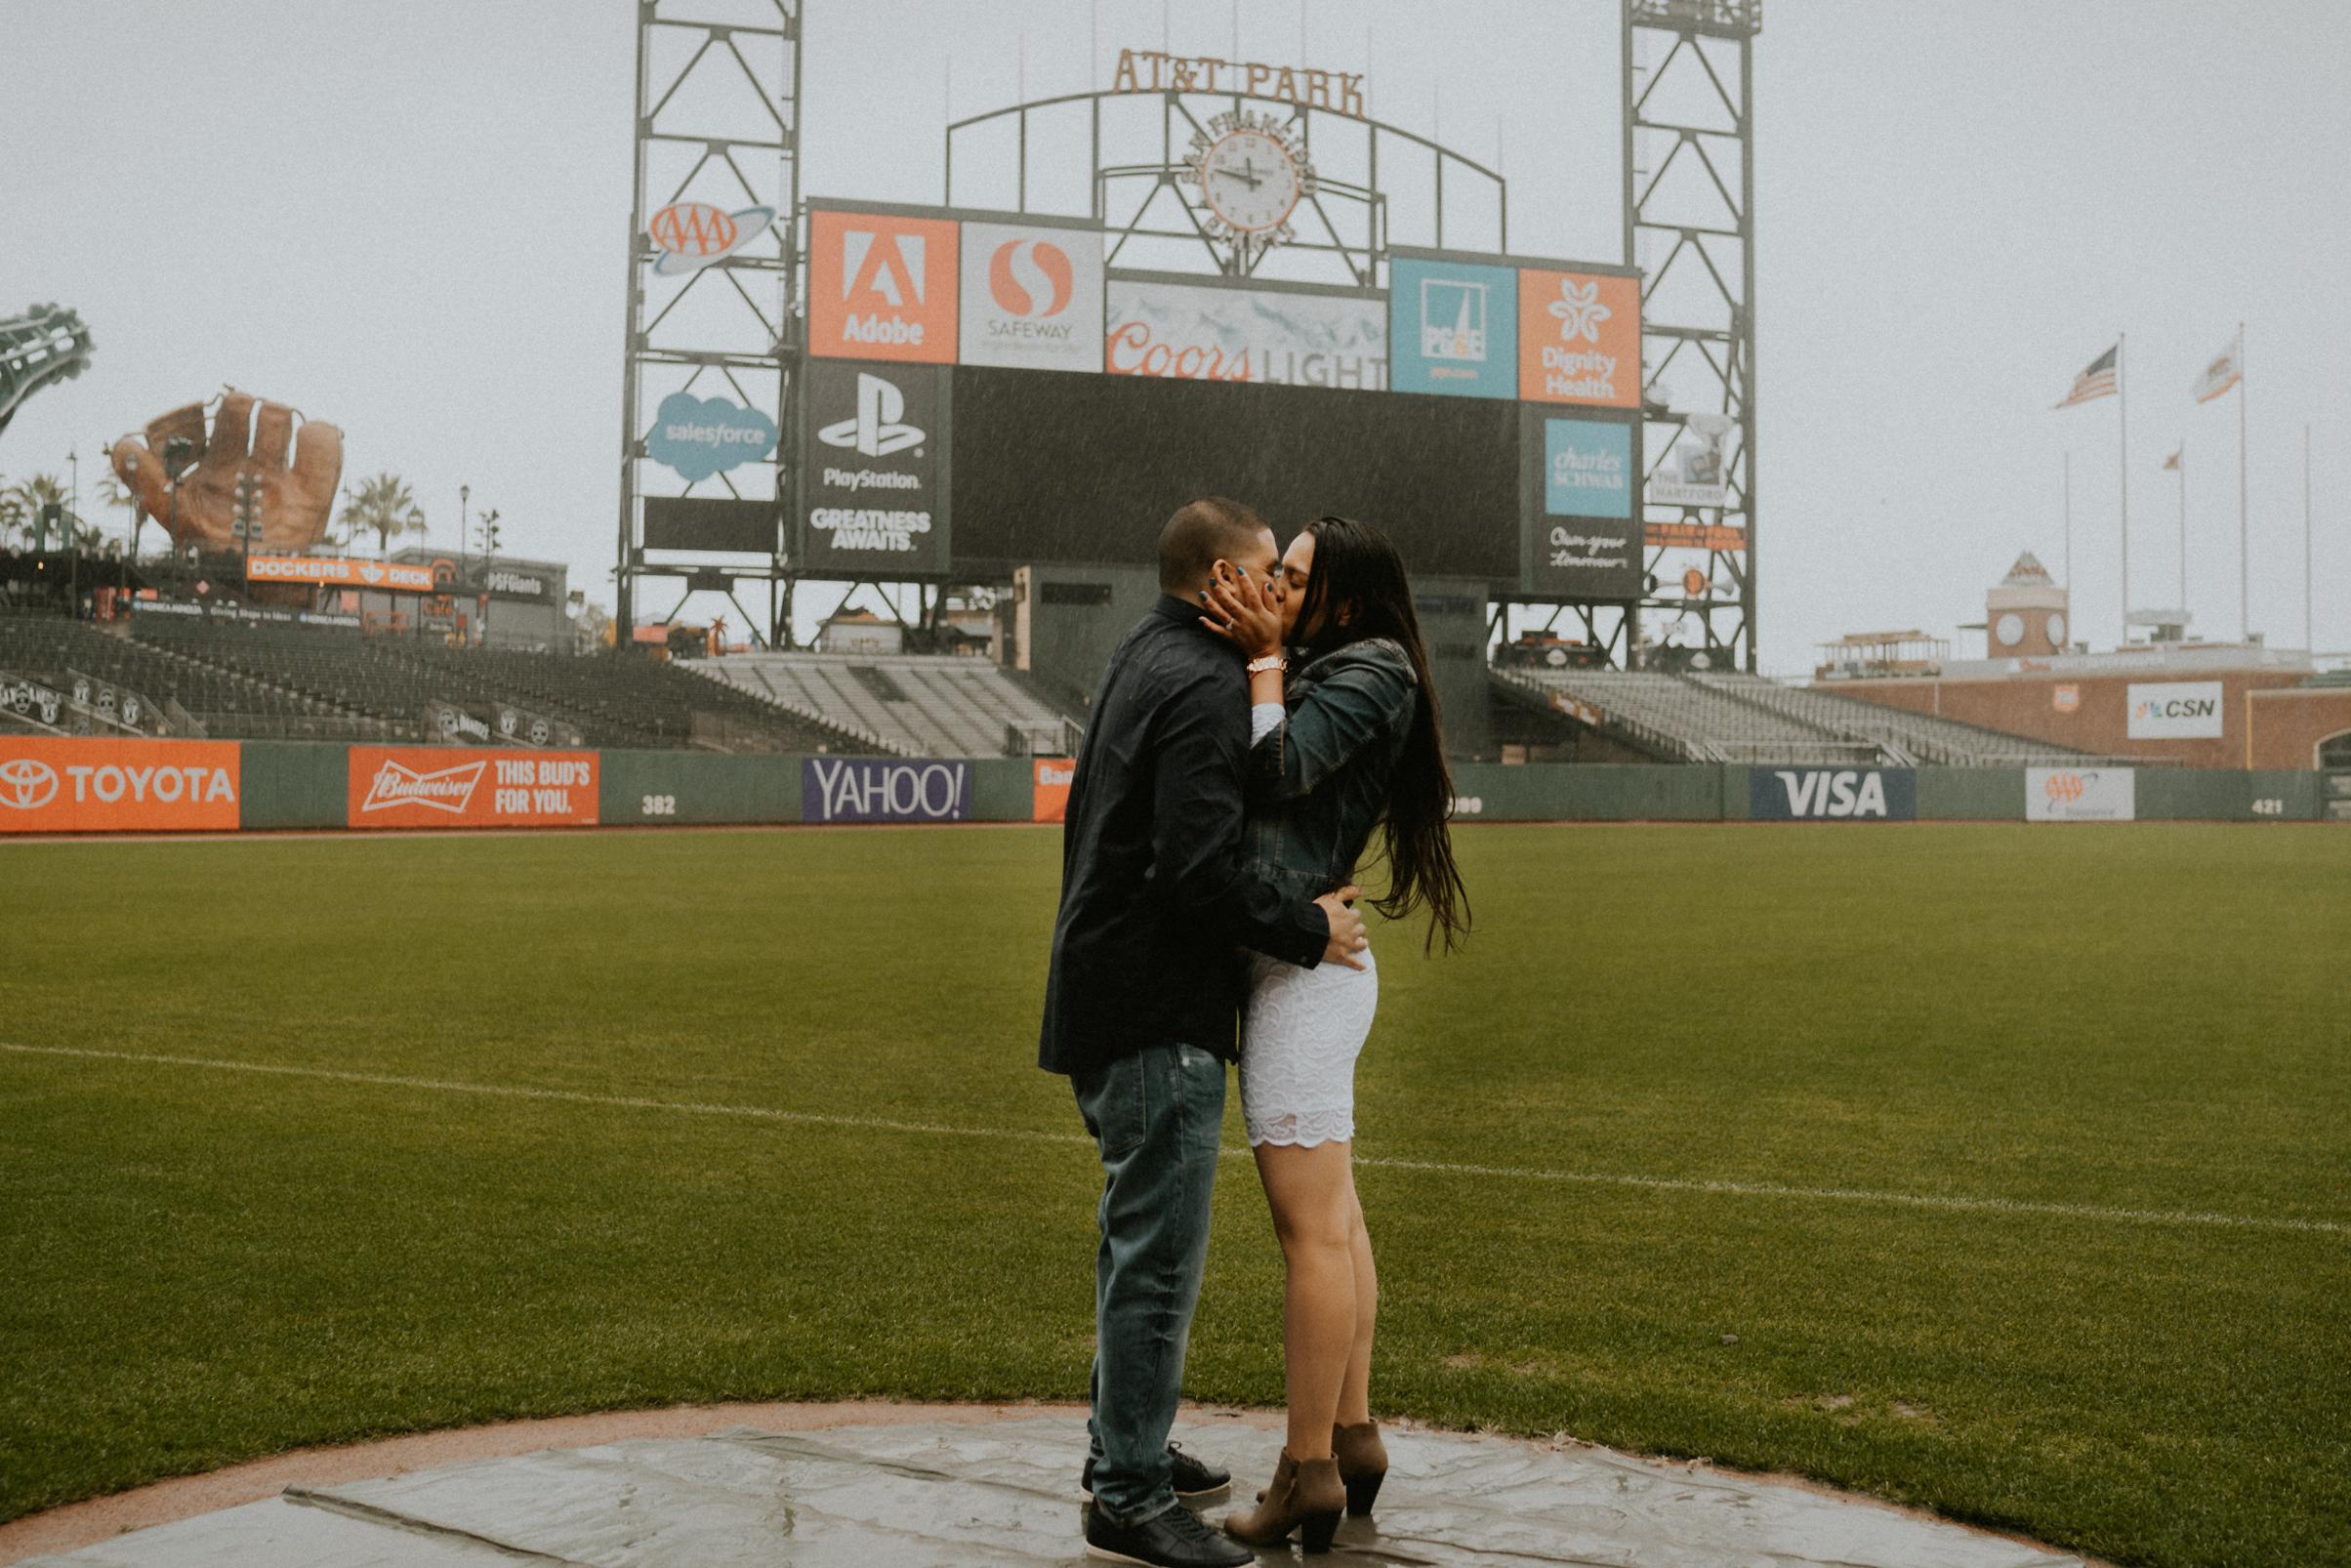 San-Francisco-engagement-wedding-photographer-Giants-AT&T-Park-26.jpg